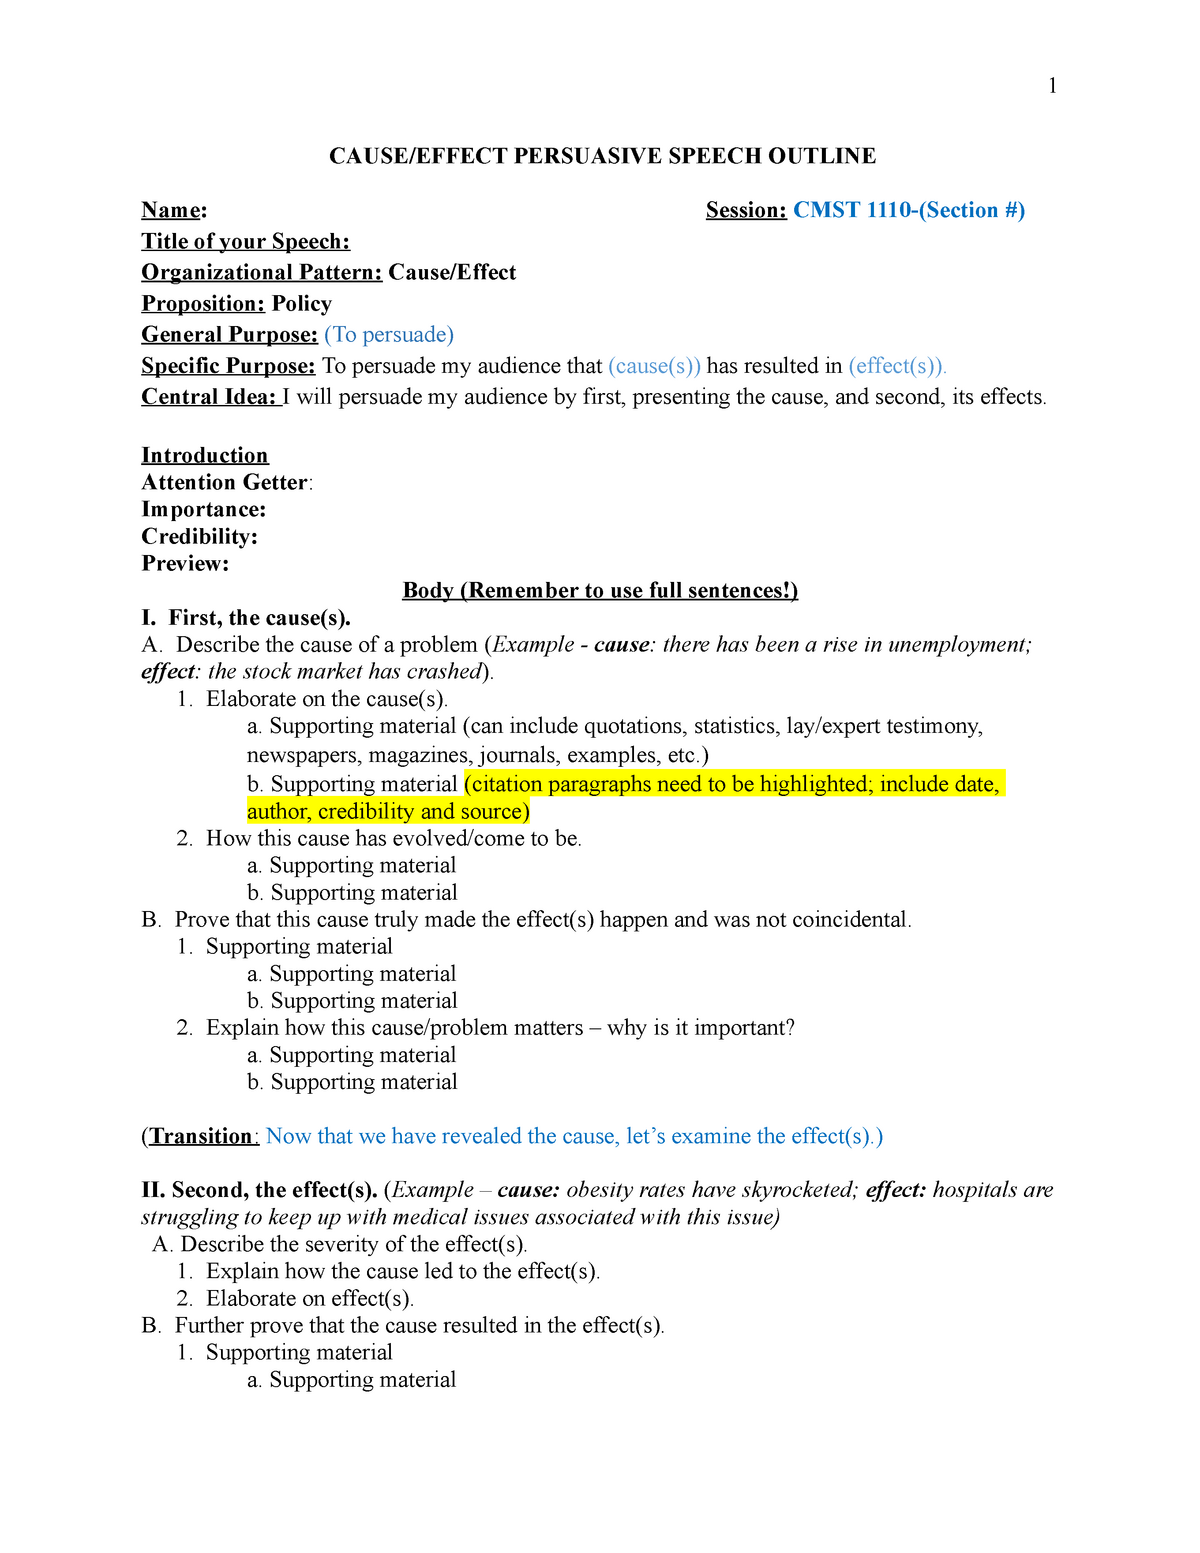 Outline persuasive example speech Examples on